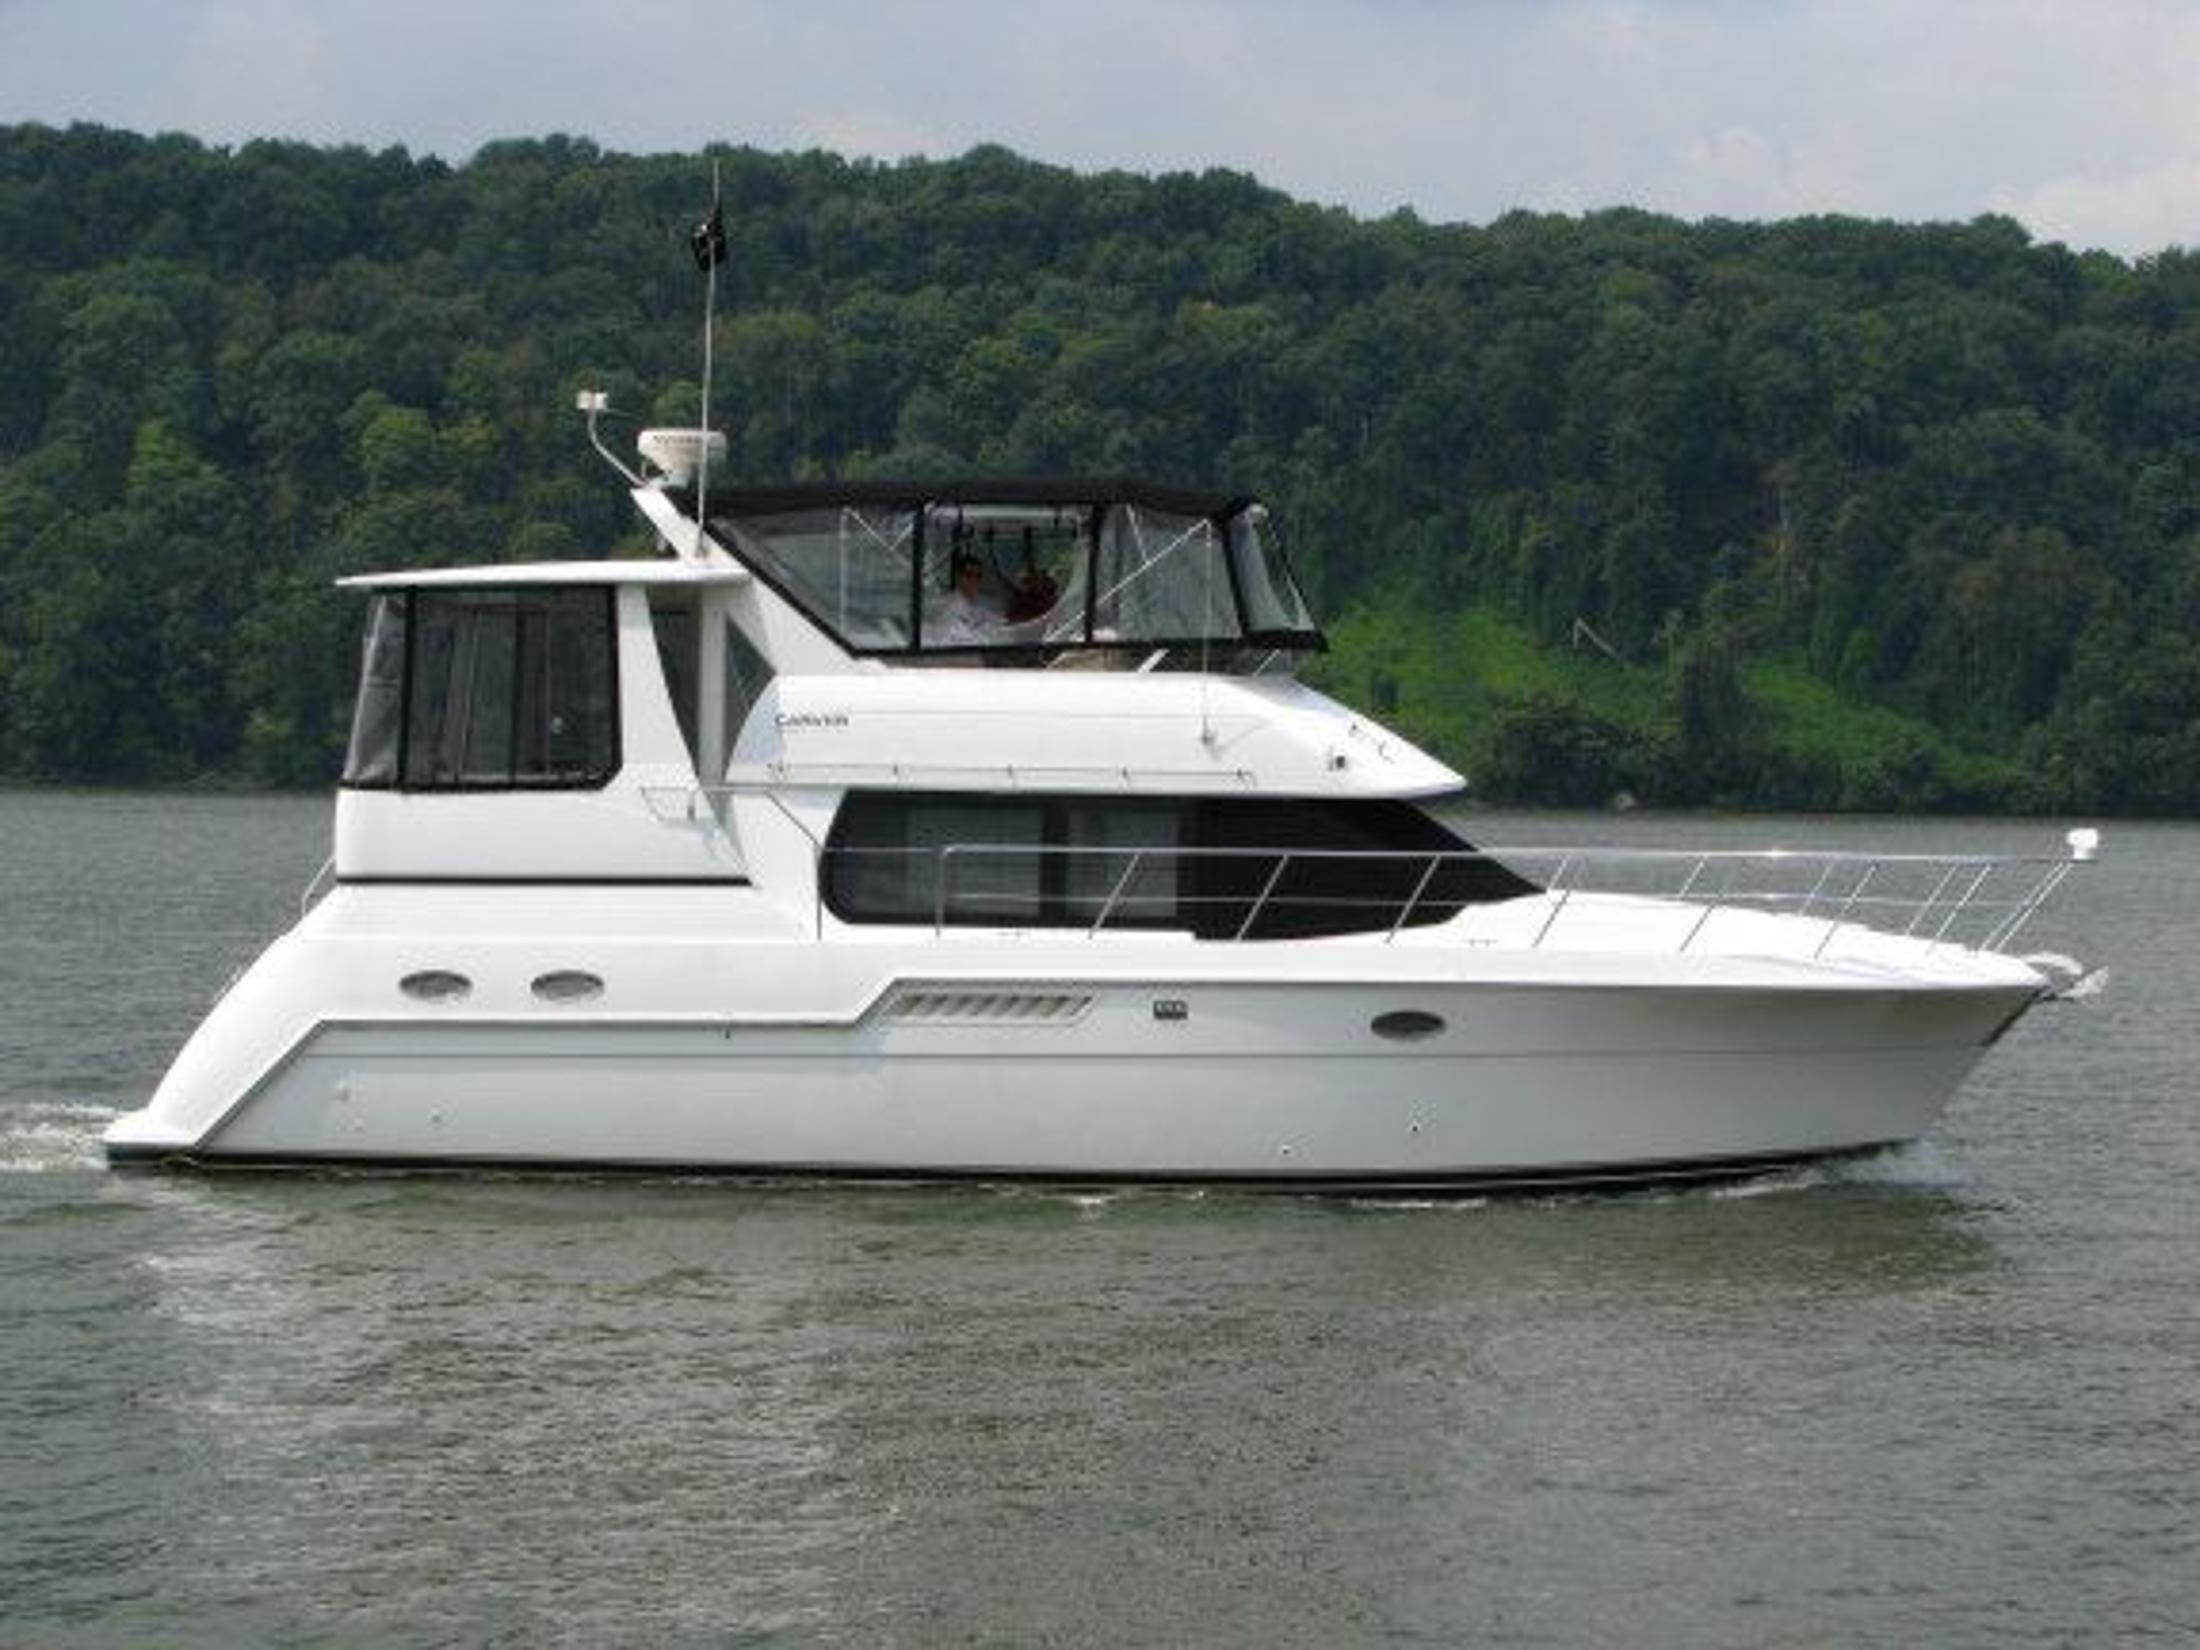 1999 carver 406 aft cabin motor yacht for sale for Large motor yachts for sale